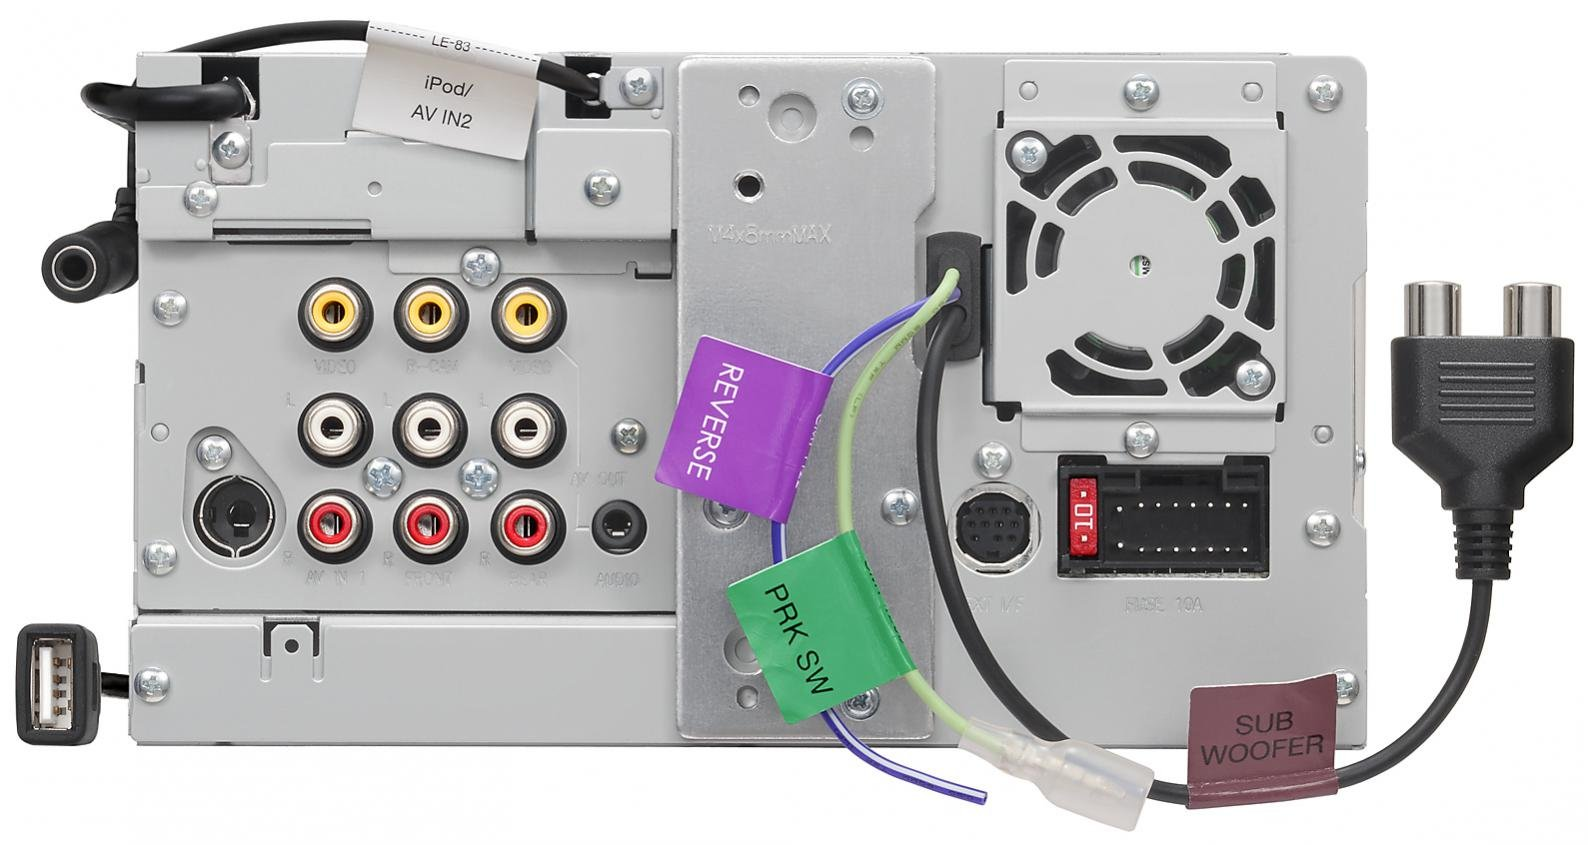 Kenwood Ddx470 Wiring Harness | Wiring Diagram on car stereo wiring diagram, kenwood wiring harness colors, wireless camera wiring diagram, backup camera wiring diagram,